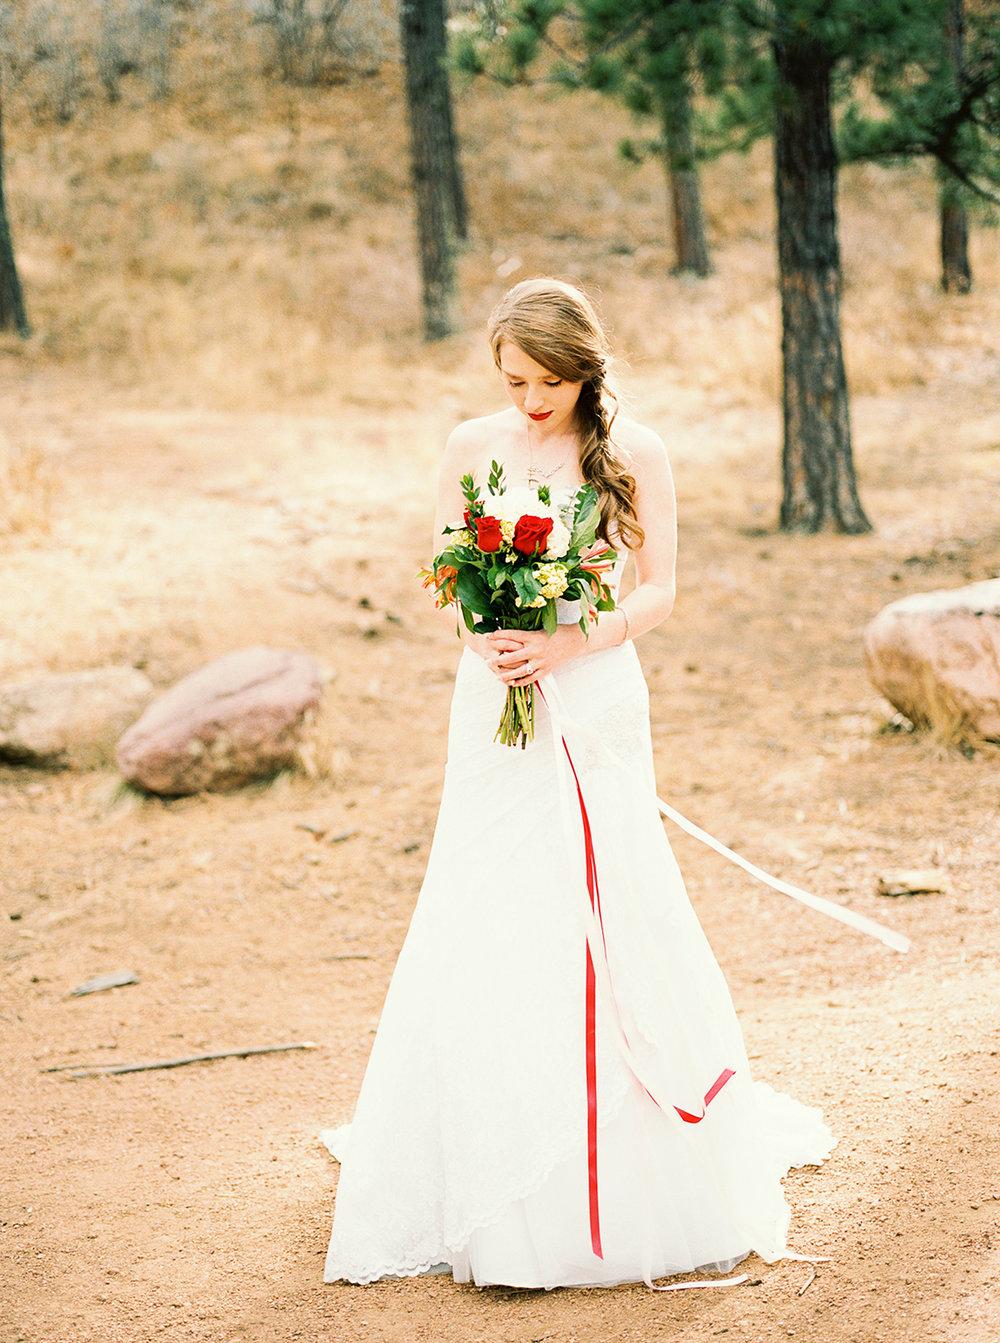 colorado-springs-military-wedding-skylar-rain-photography-j-d-7.jpg